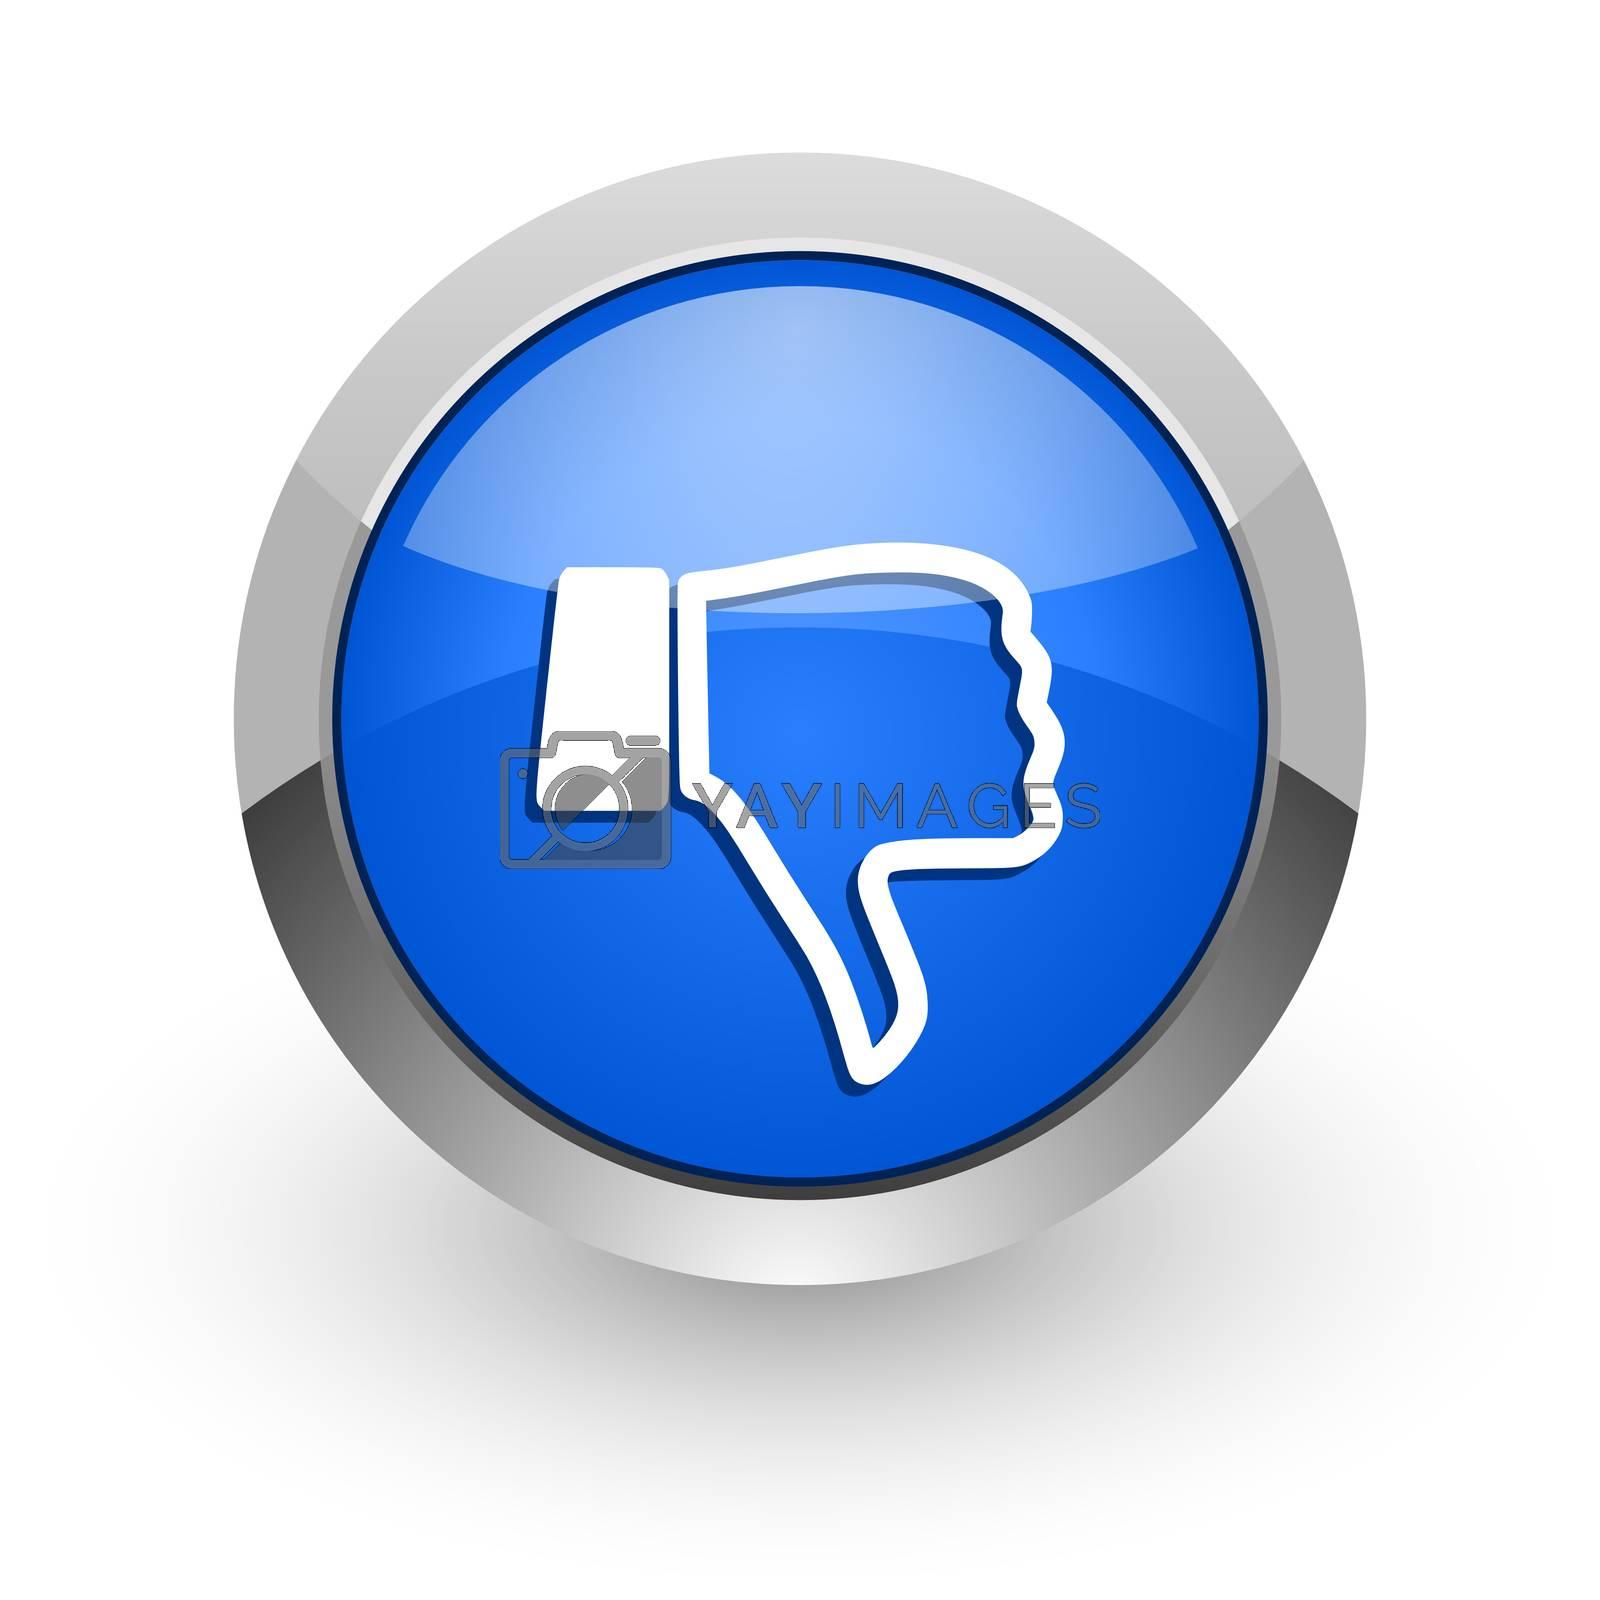 Royalty free image of dislike blue glossy web icon by alexwhite